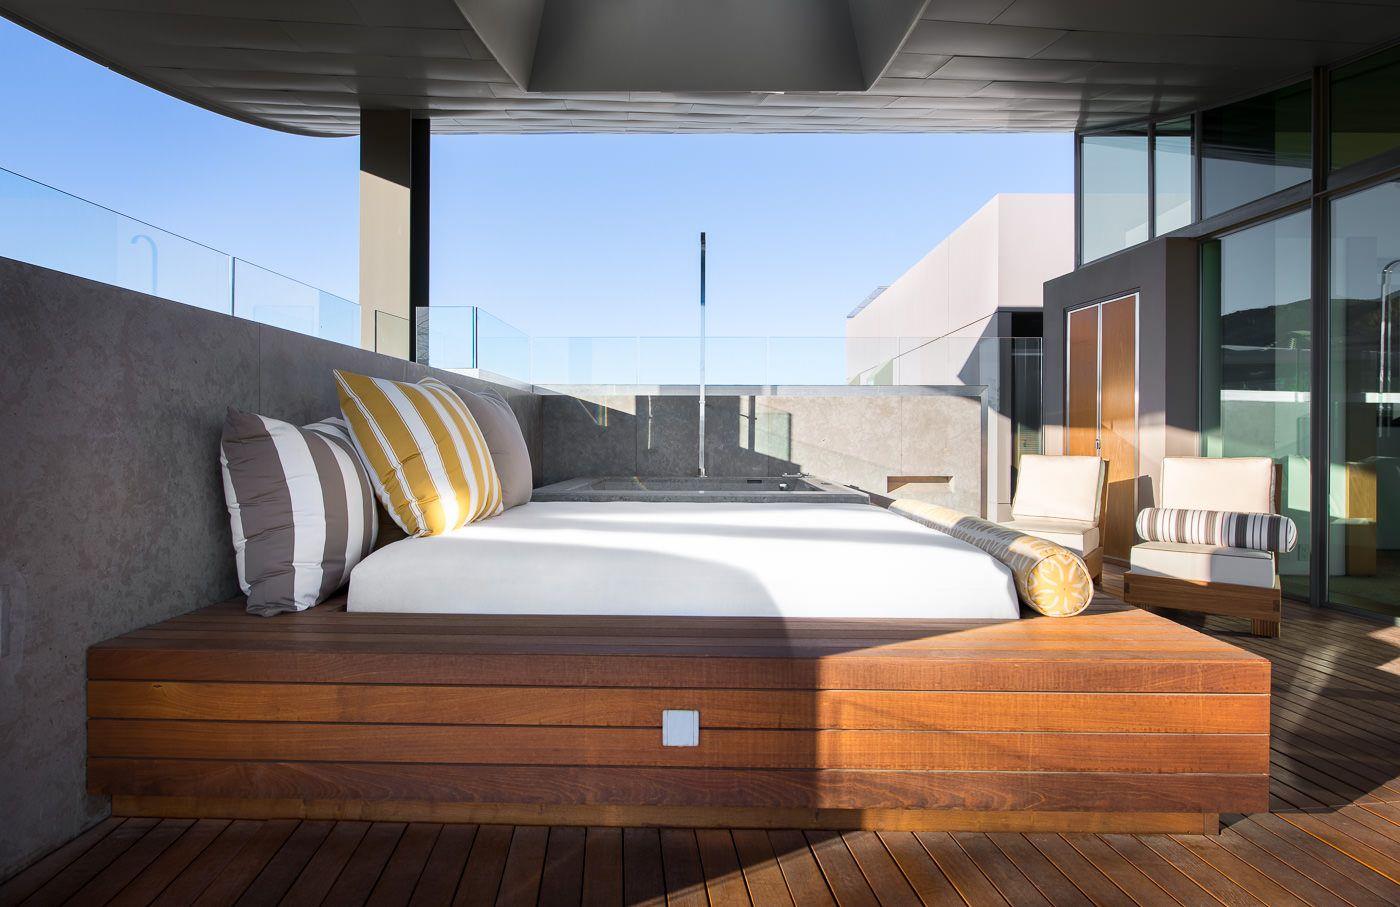 Hottub and Lounge Deck CAVU Las Vegas Outdoor bed